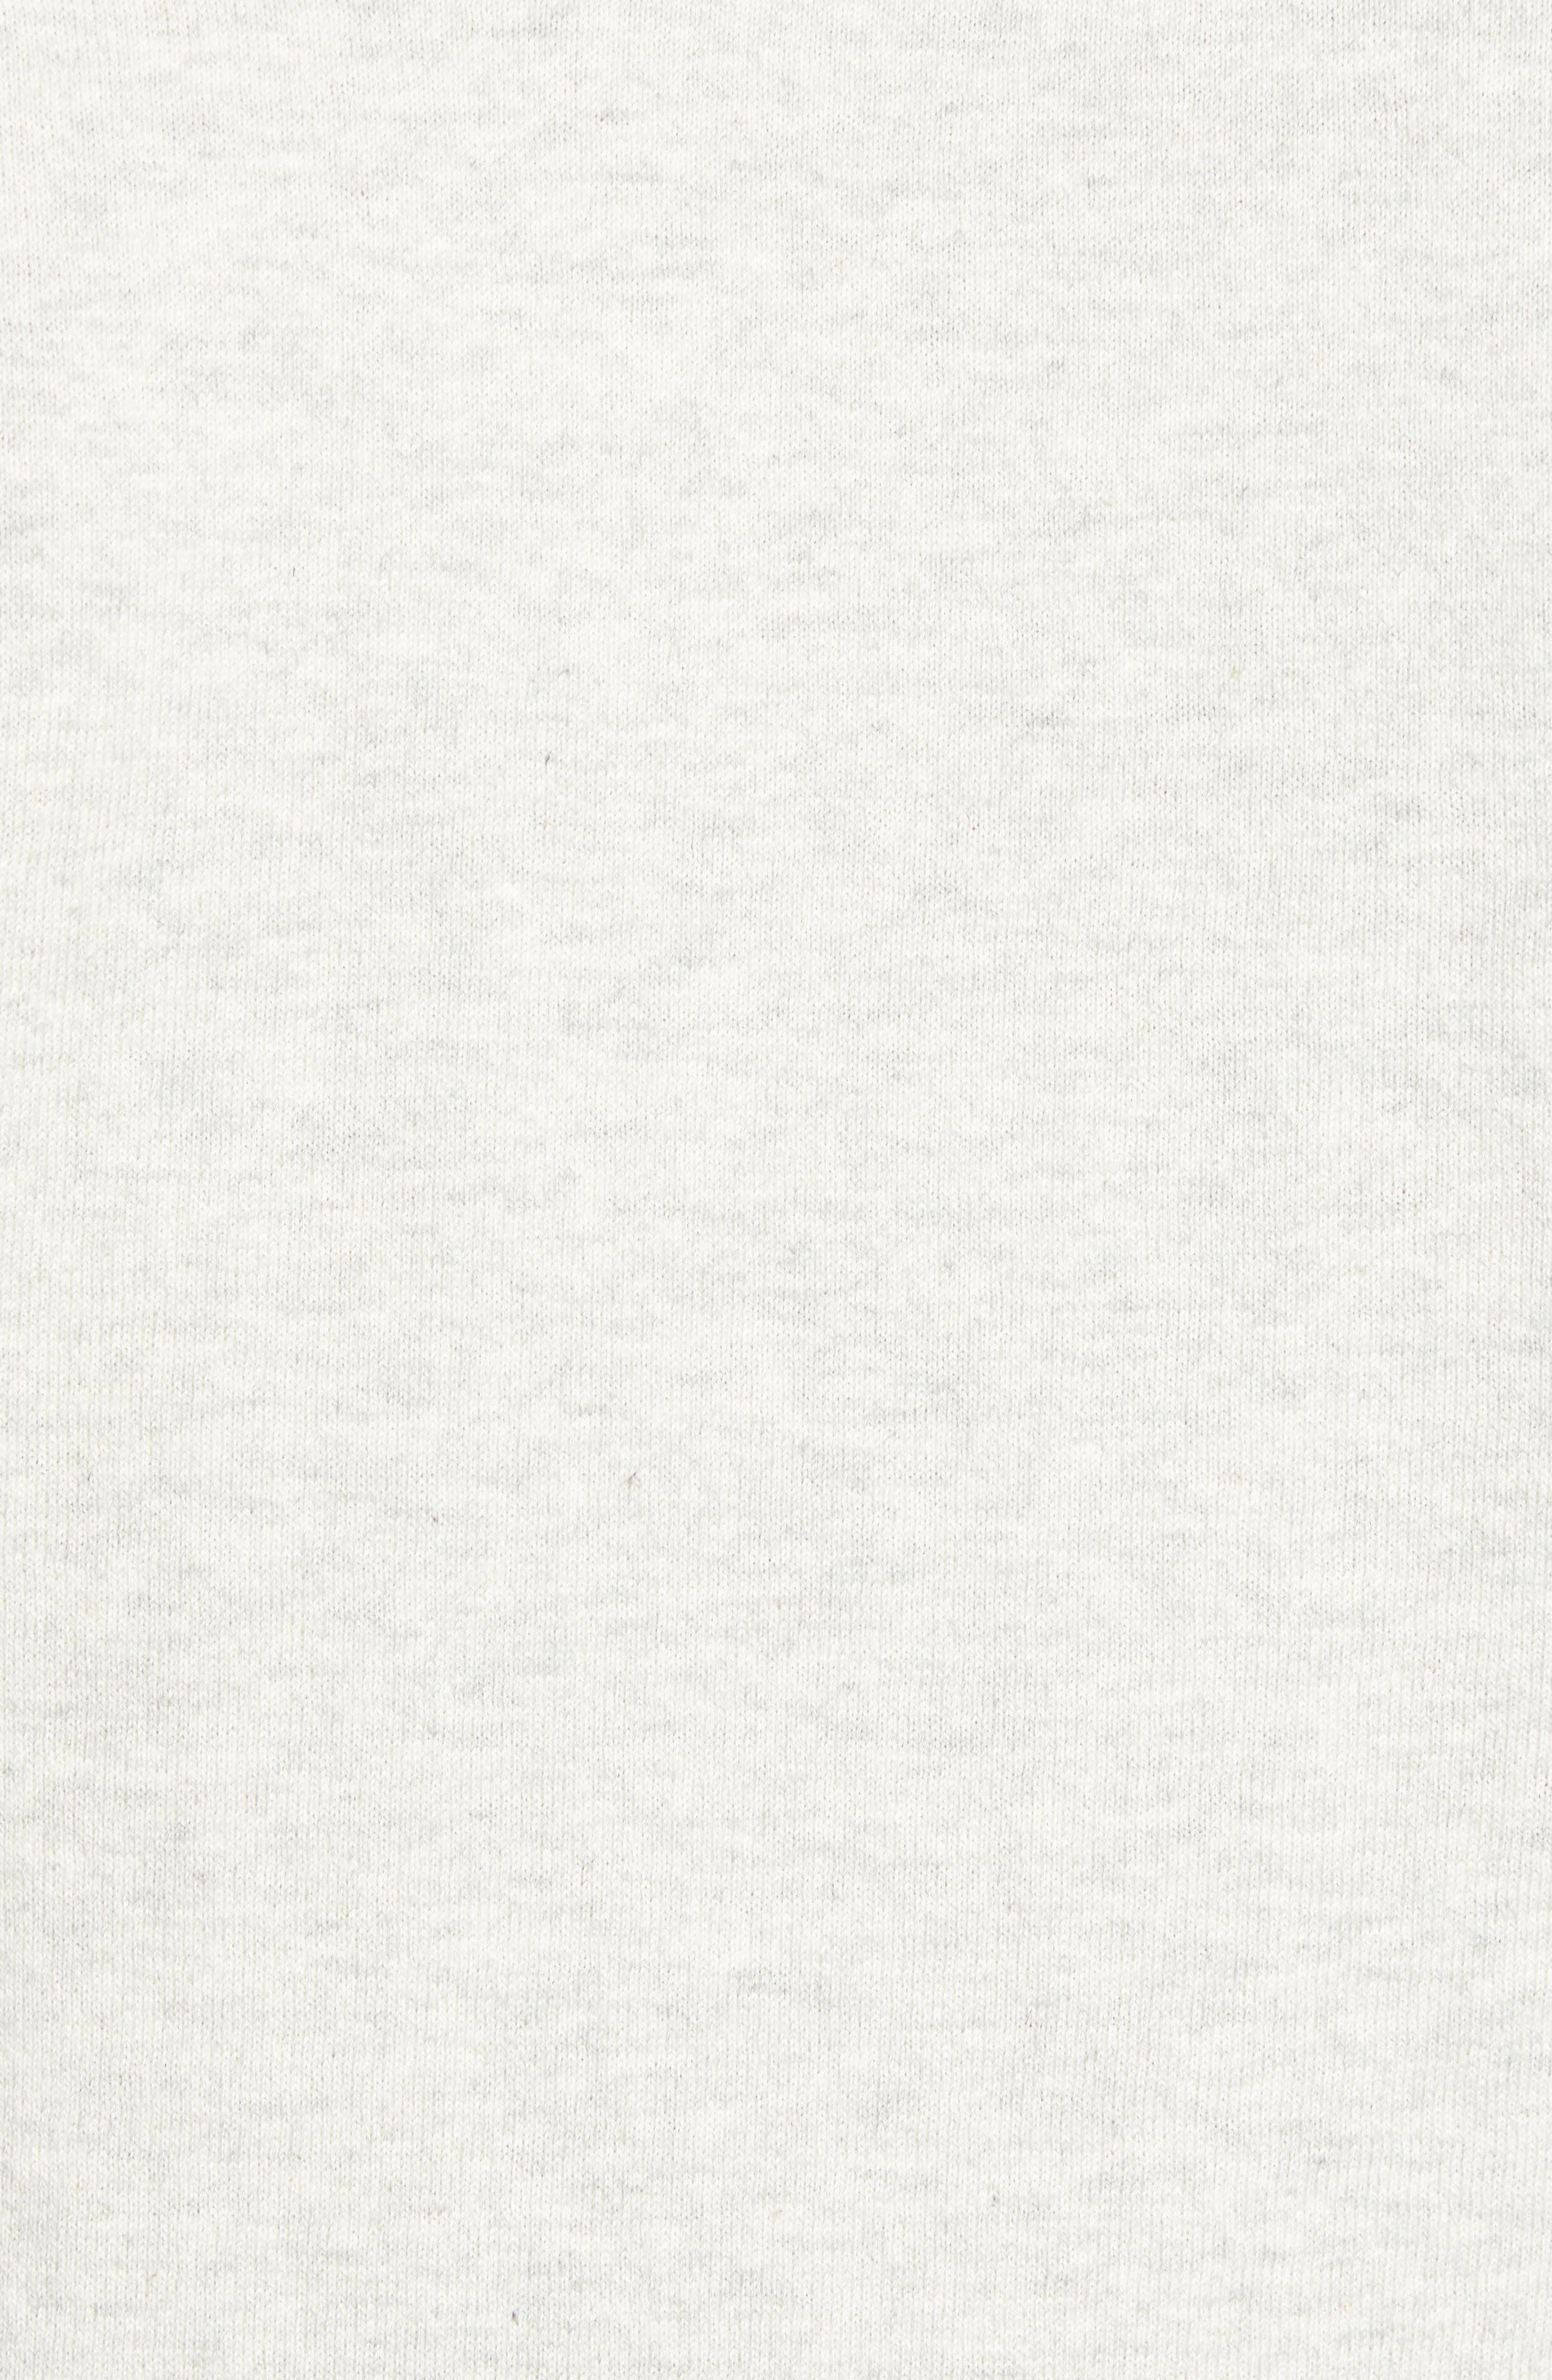 Crewneck Sweatshirt,                             Alternate thumbnail 5, color,                             BONE WHITE MELANGE